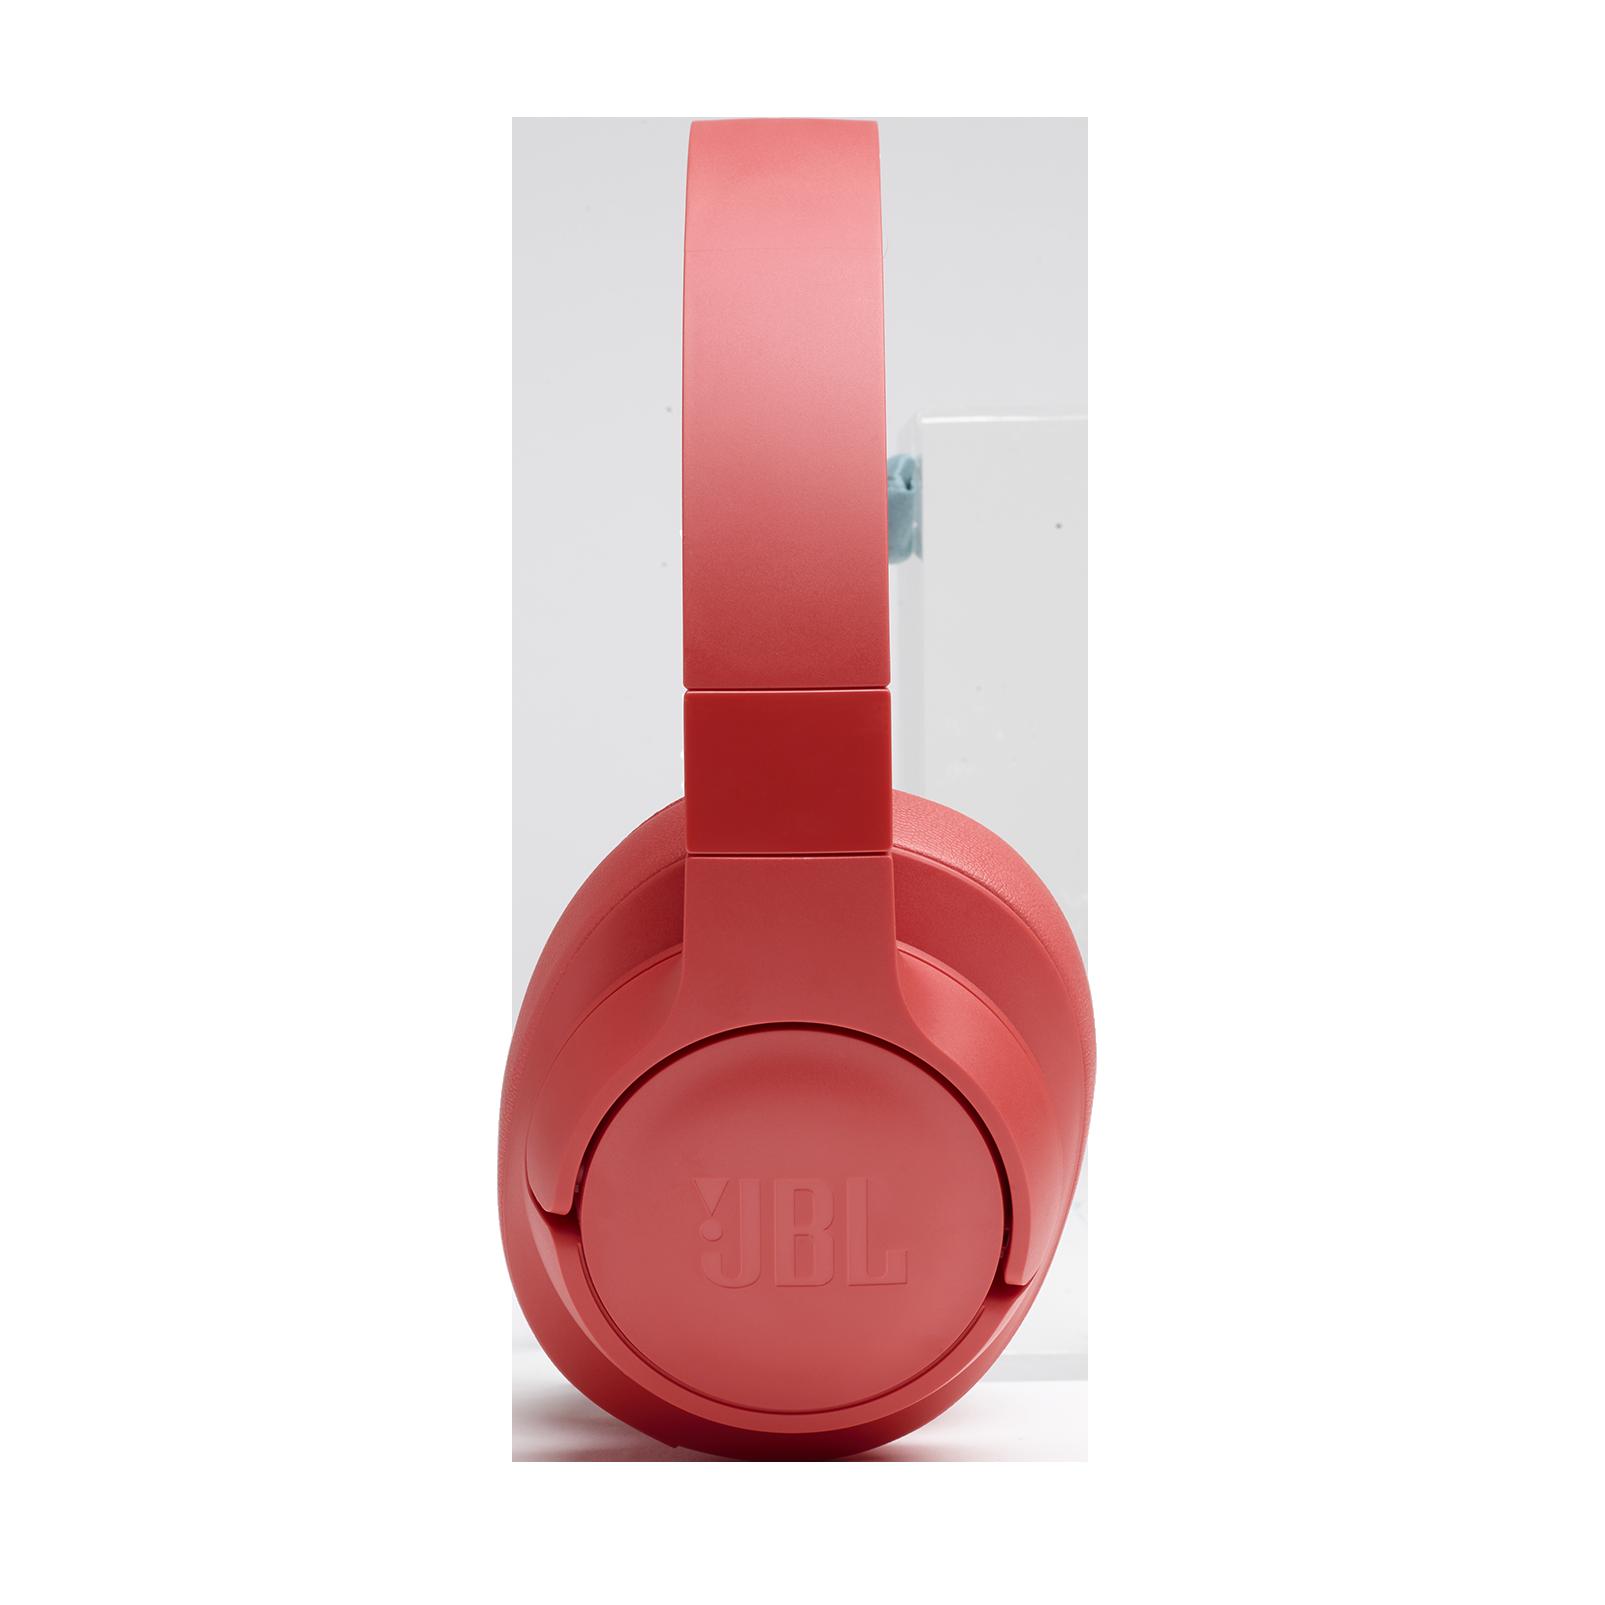 JBL TUNE 700BT - Coral Orange - Wireless Over-Ear Headphones - Detailshot 4